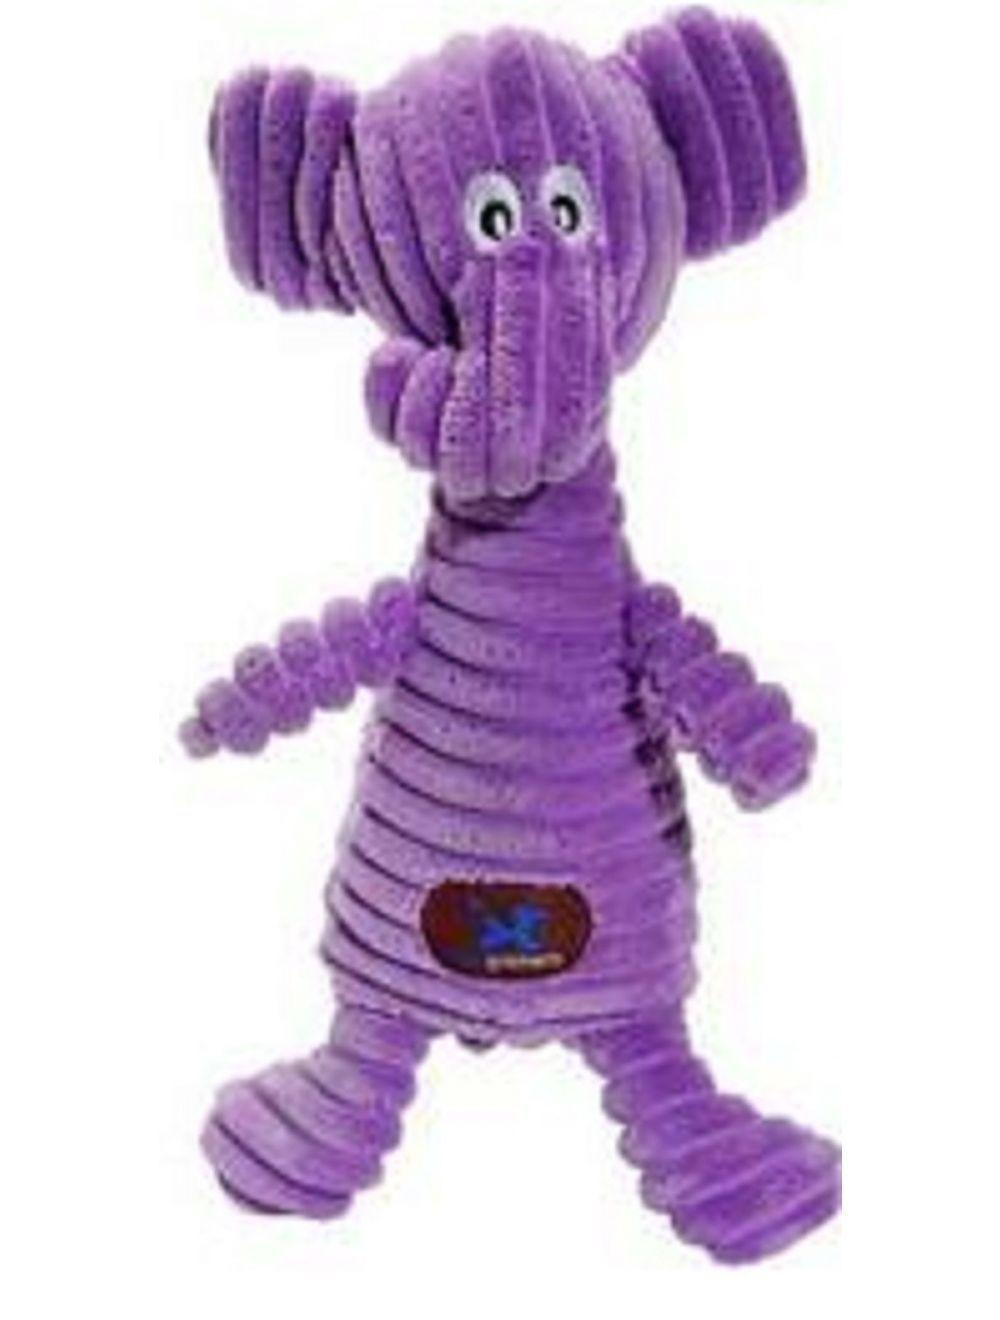 Juguete Charming pet squeakin elefante - Ciudaddemascotas.com